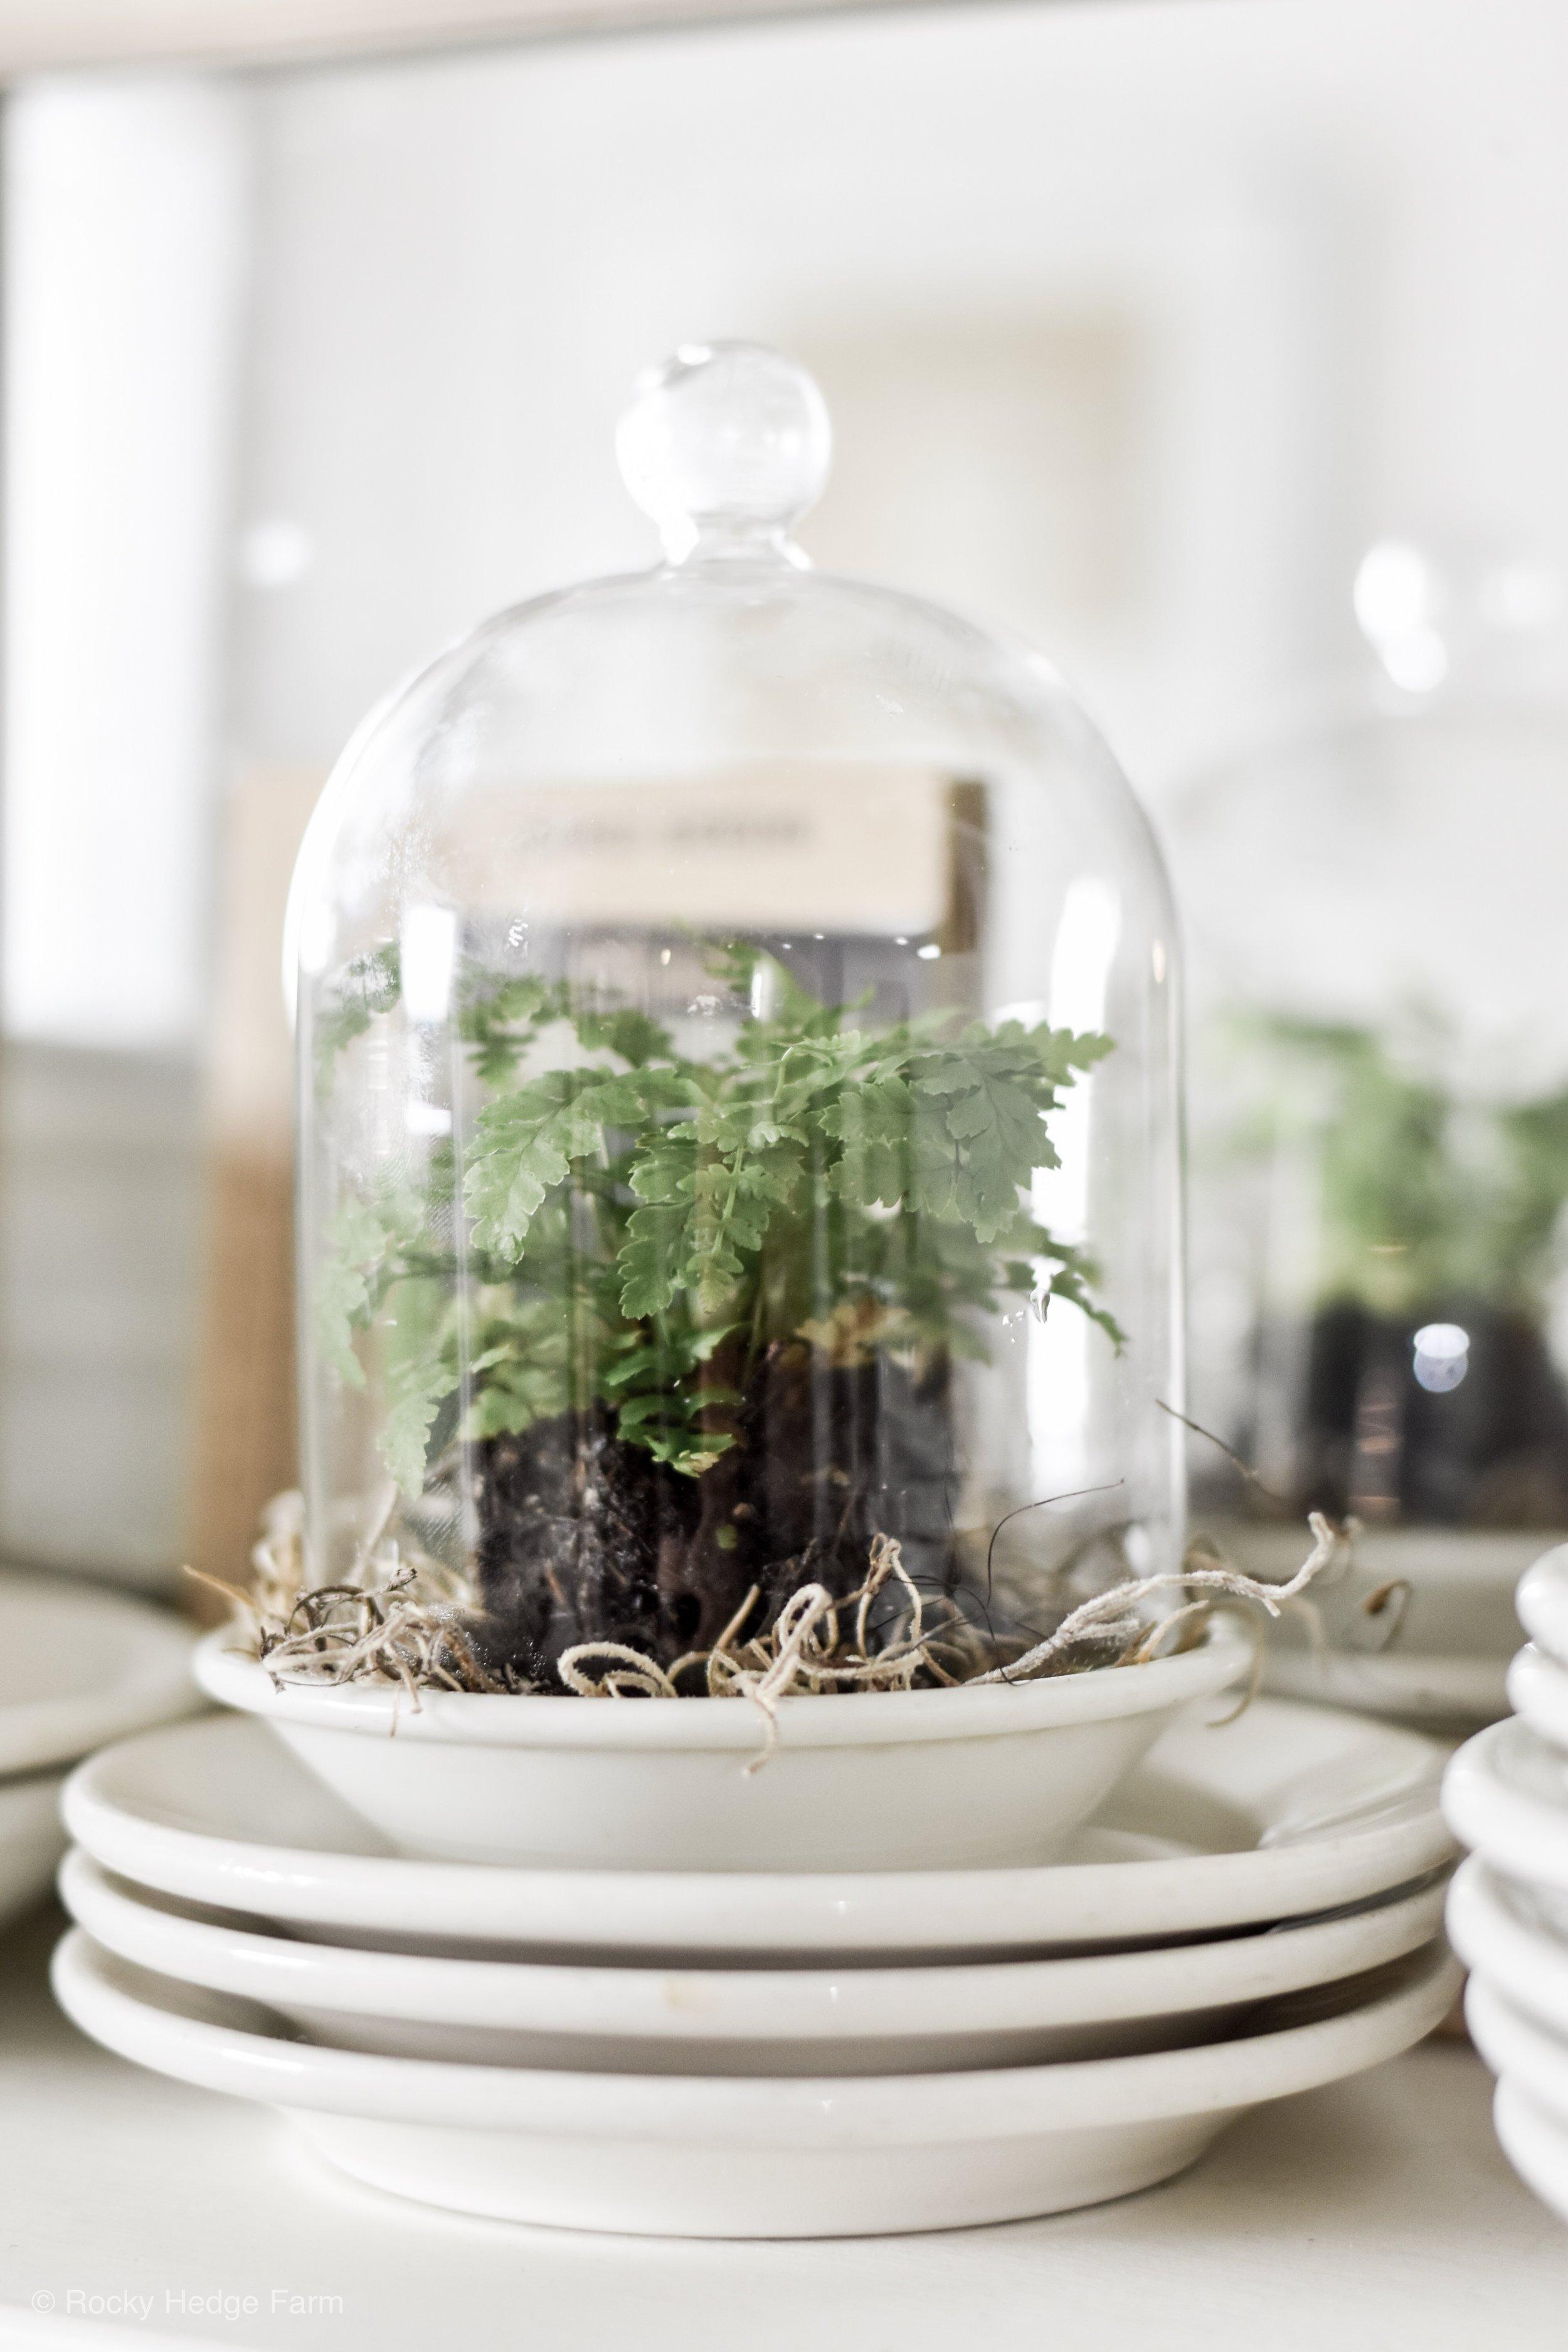 DIY Glass Plant Cloche - Plants to Grow Under a Cloche | Rocky Hedge Farm